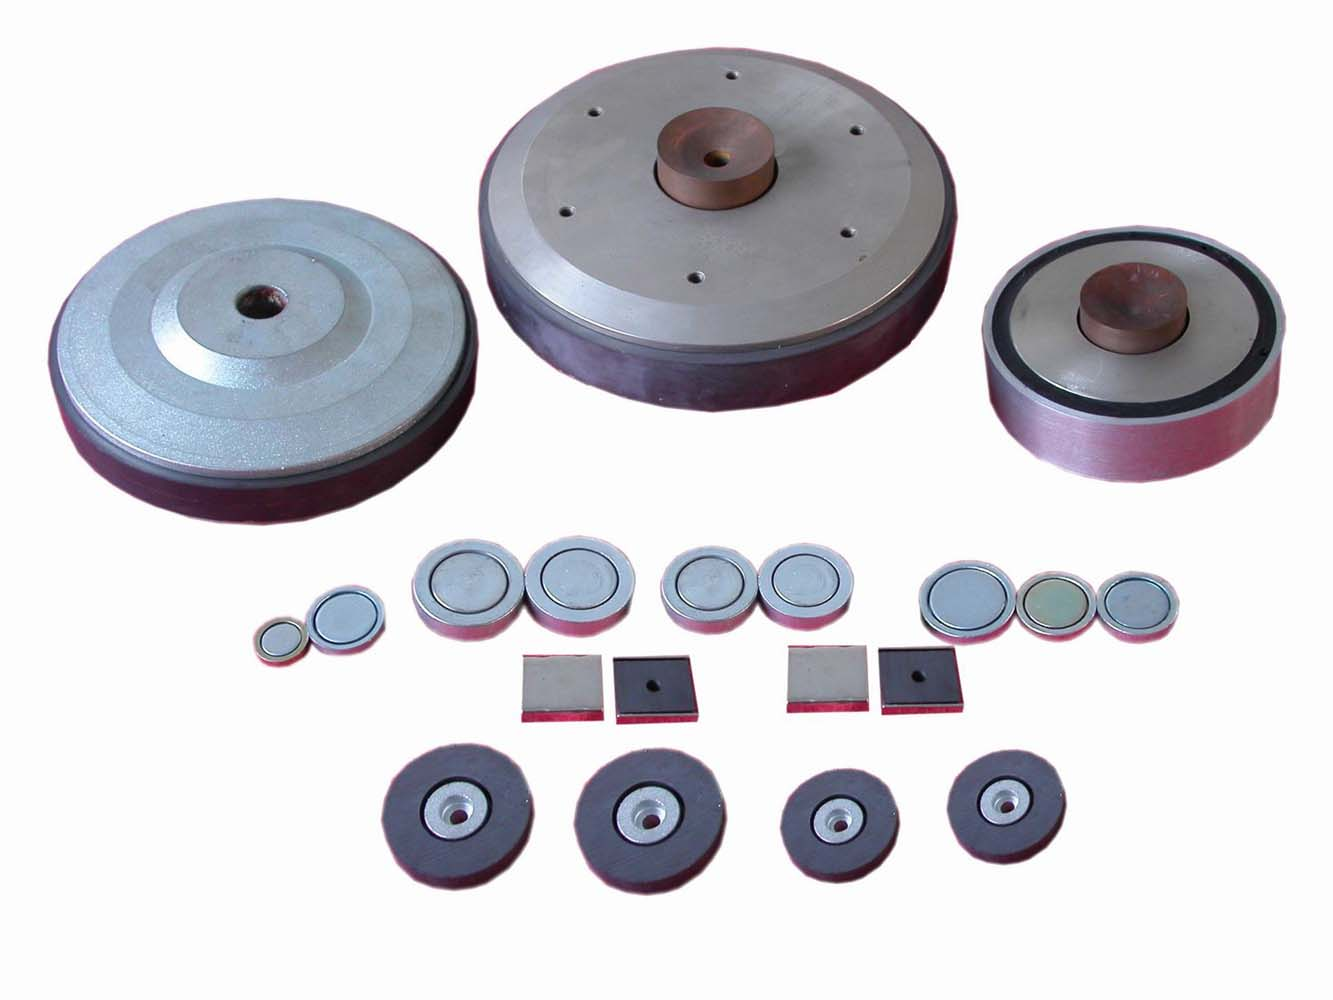 Rubber Magnet, NdFeb, Ferrite, Alnico, Magnetizer, Magnetic Assemblies (Резиновый магнит, NdFeB, феррита, Alnico, Магнетизера, Магнитные Ассамблей)